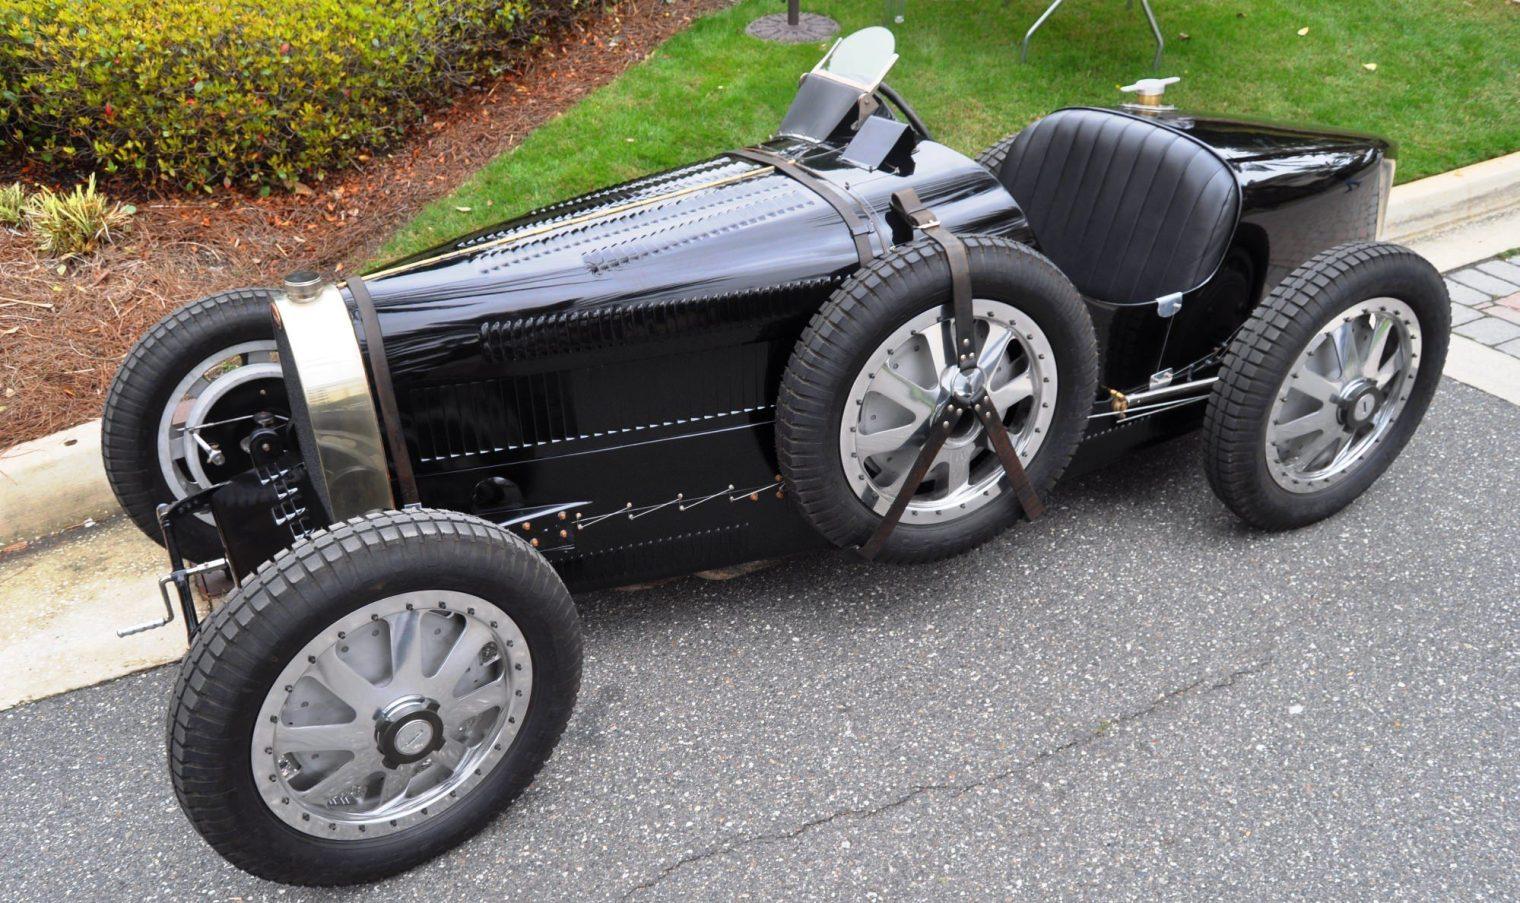 PurSang Argentina Shows Innovative Marketing with Street-Parked 1920s Bugatti GP Car29